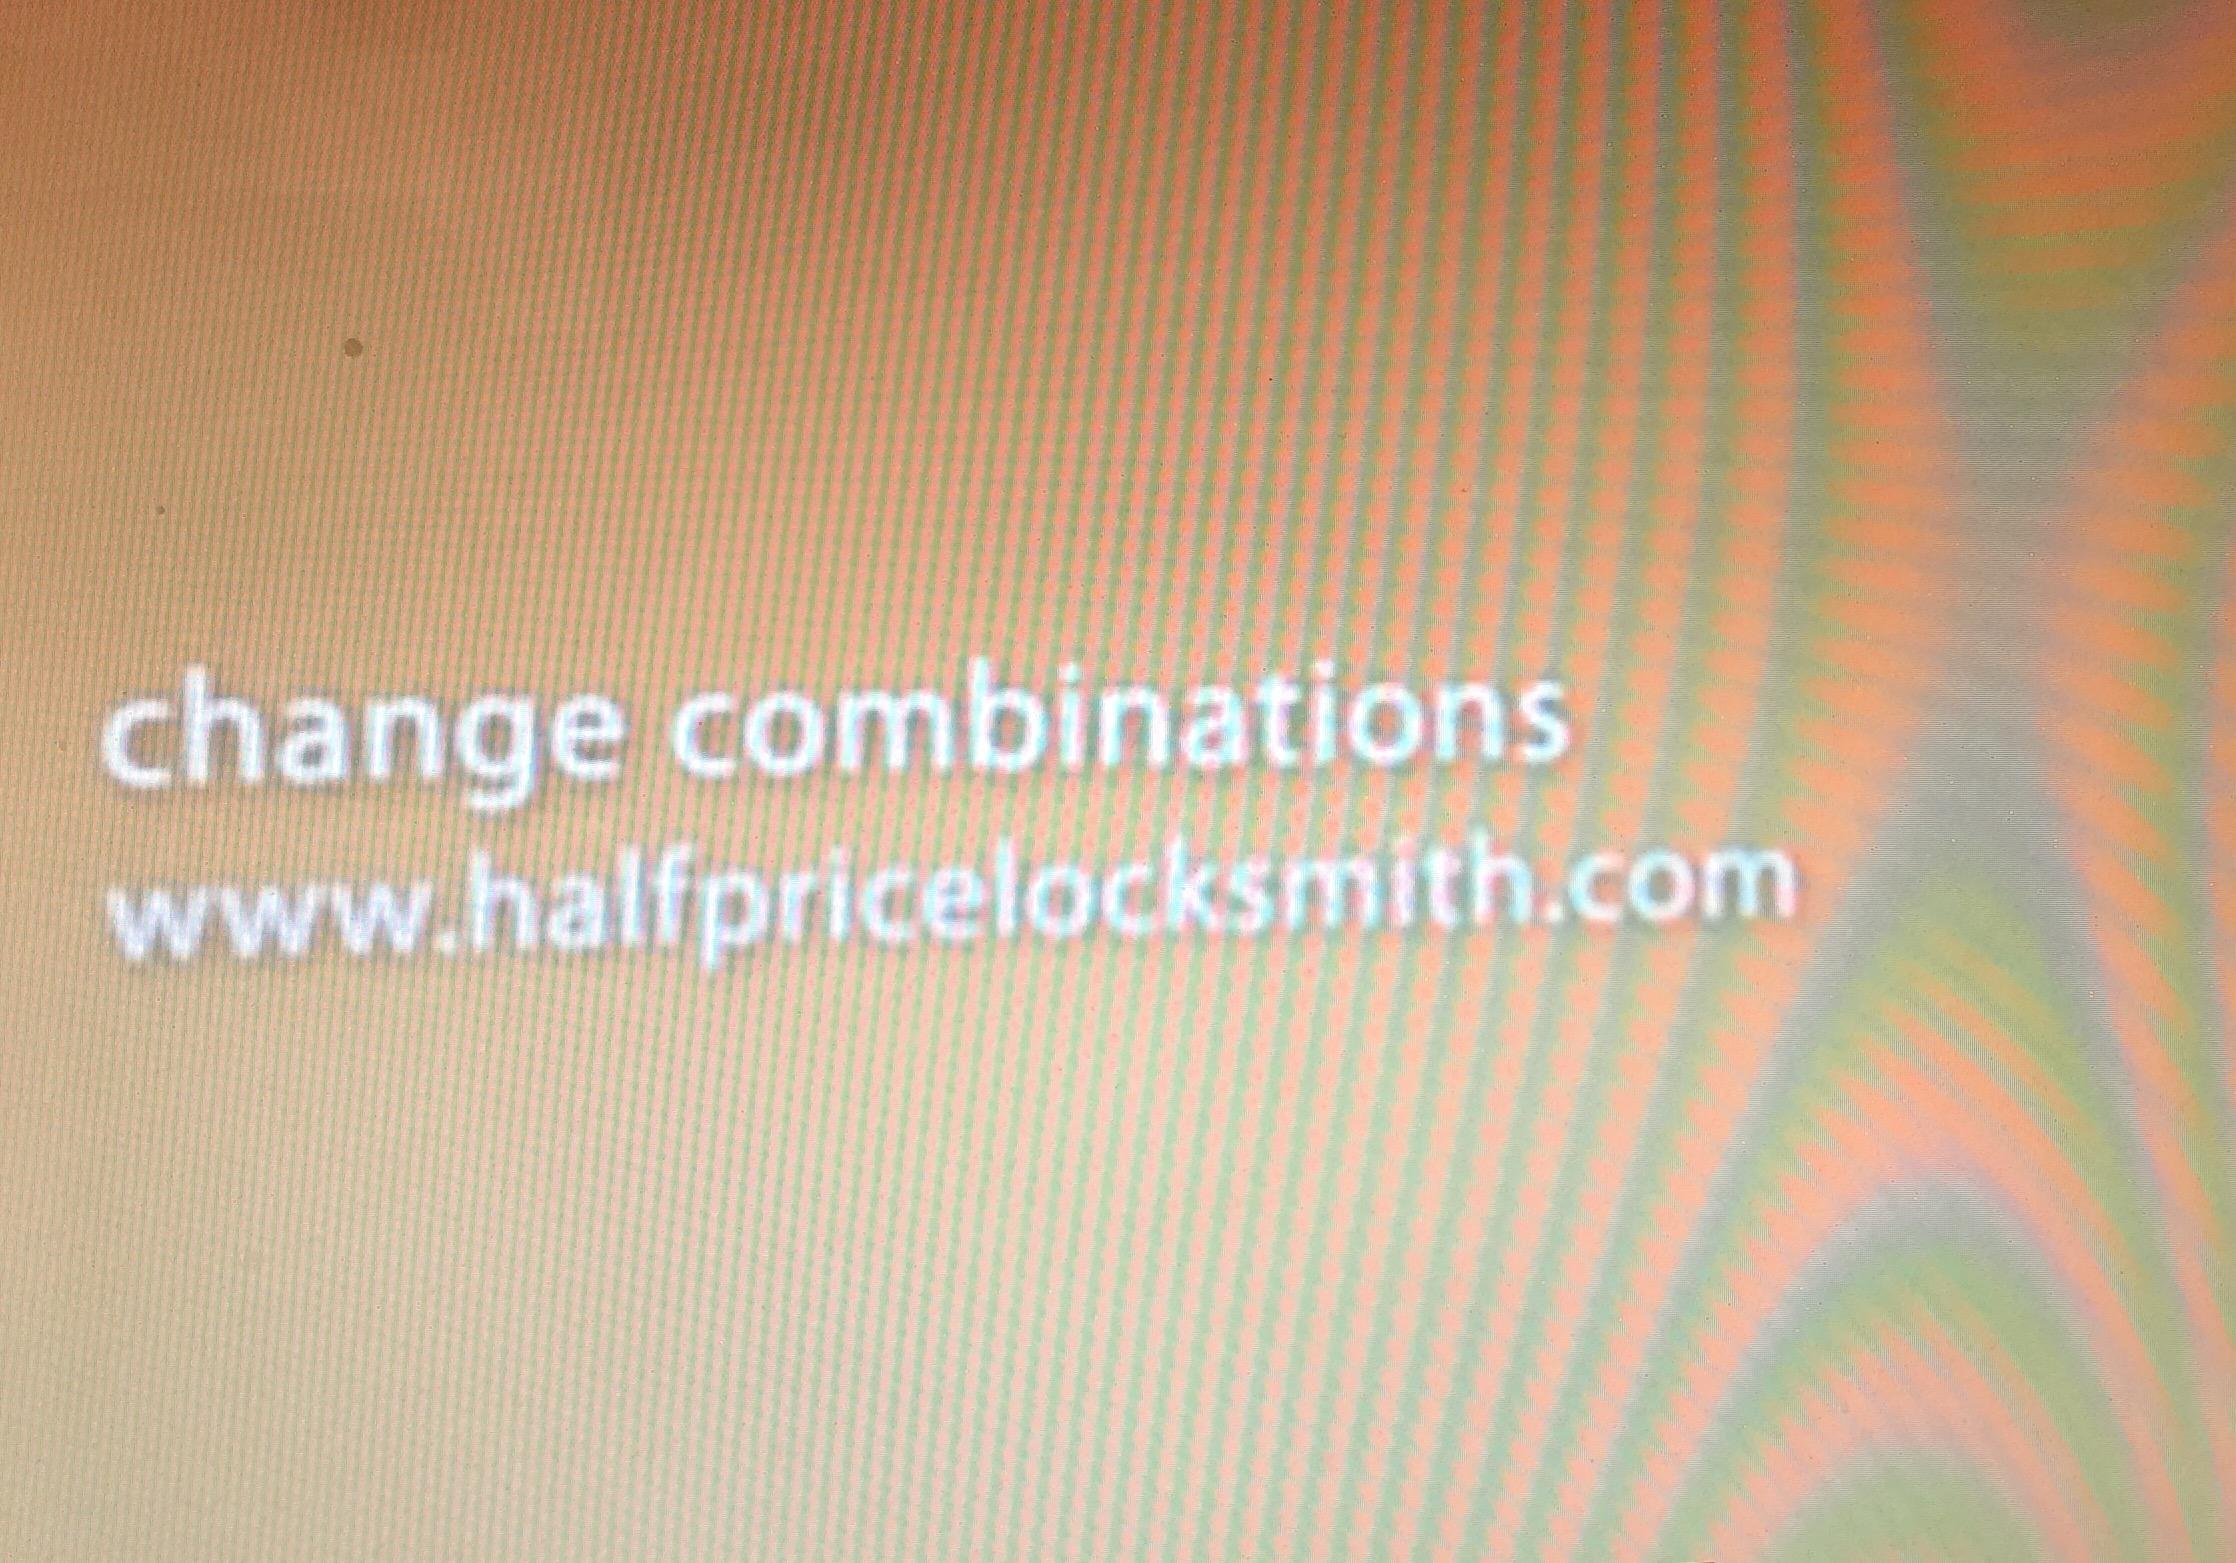 Half Price Locksmith image 17